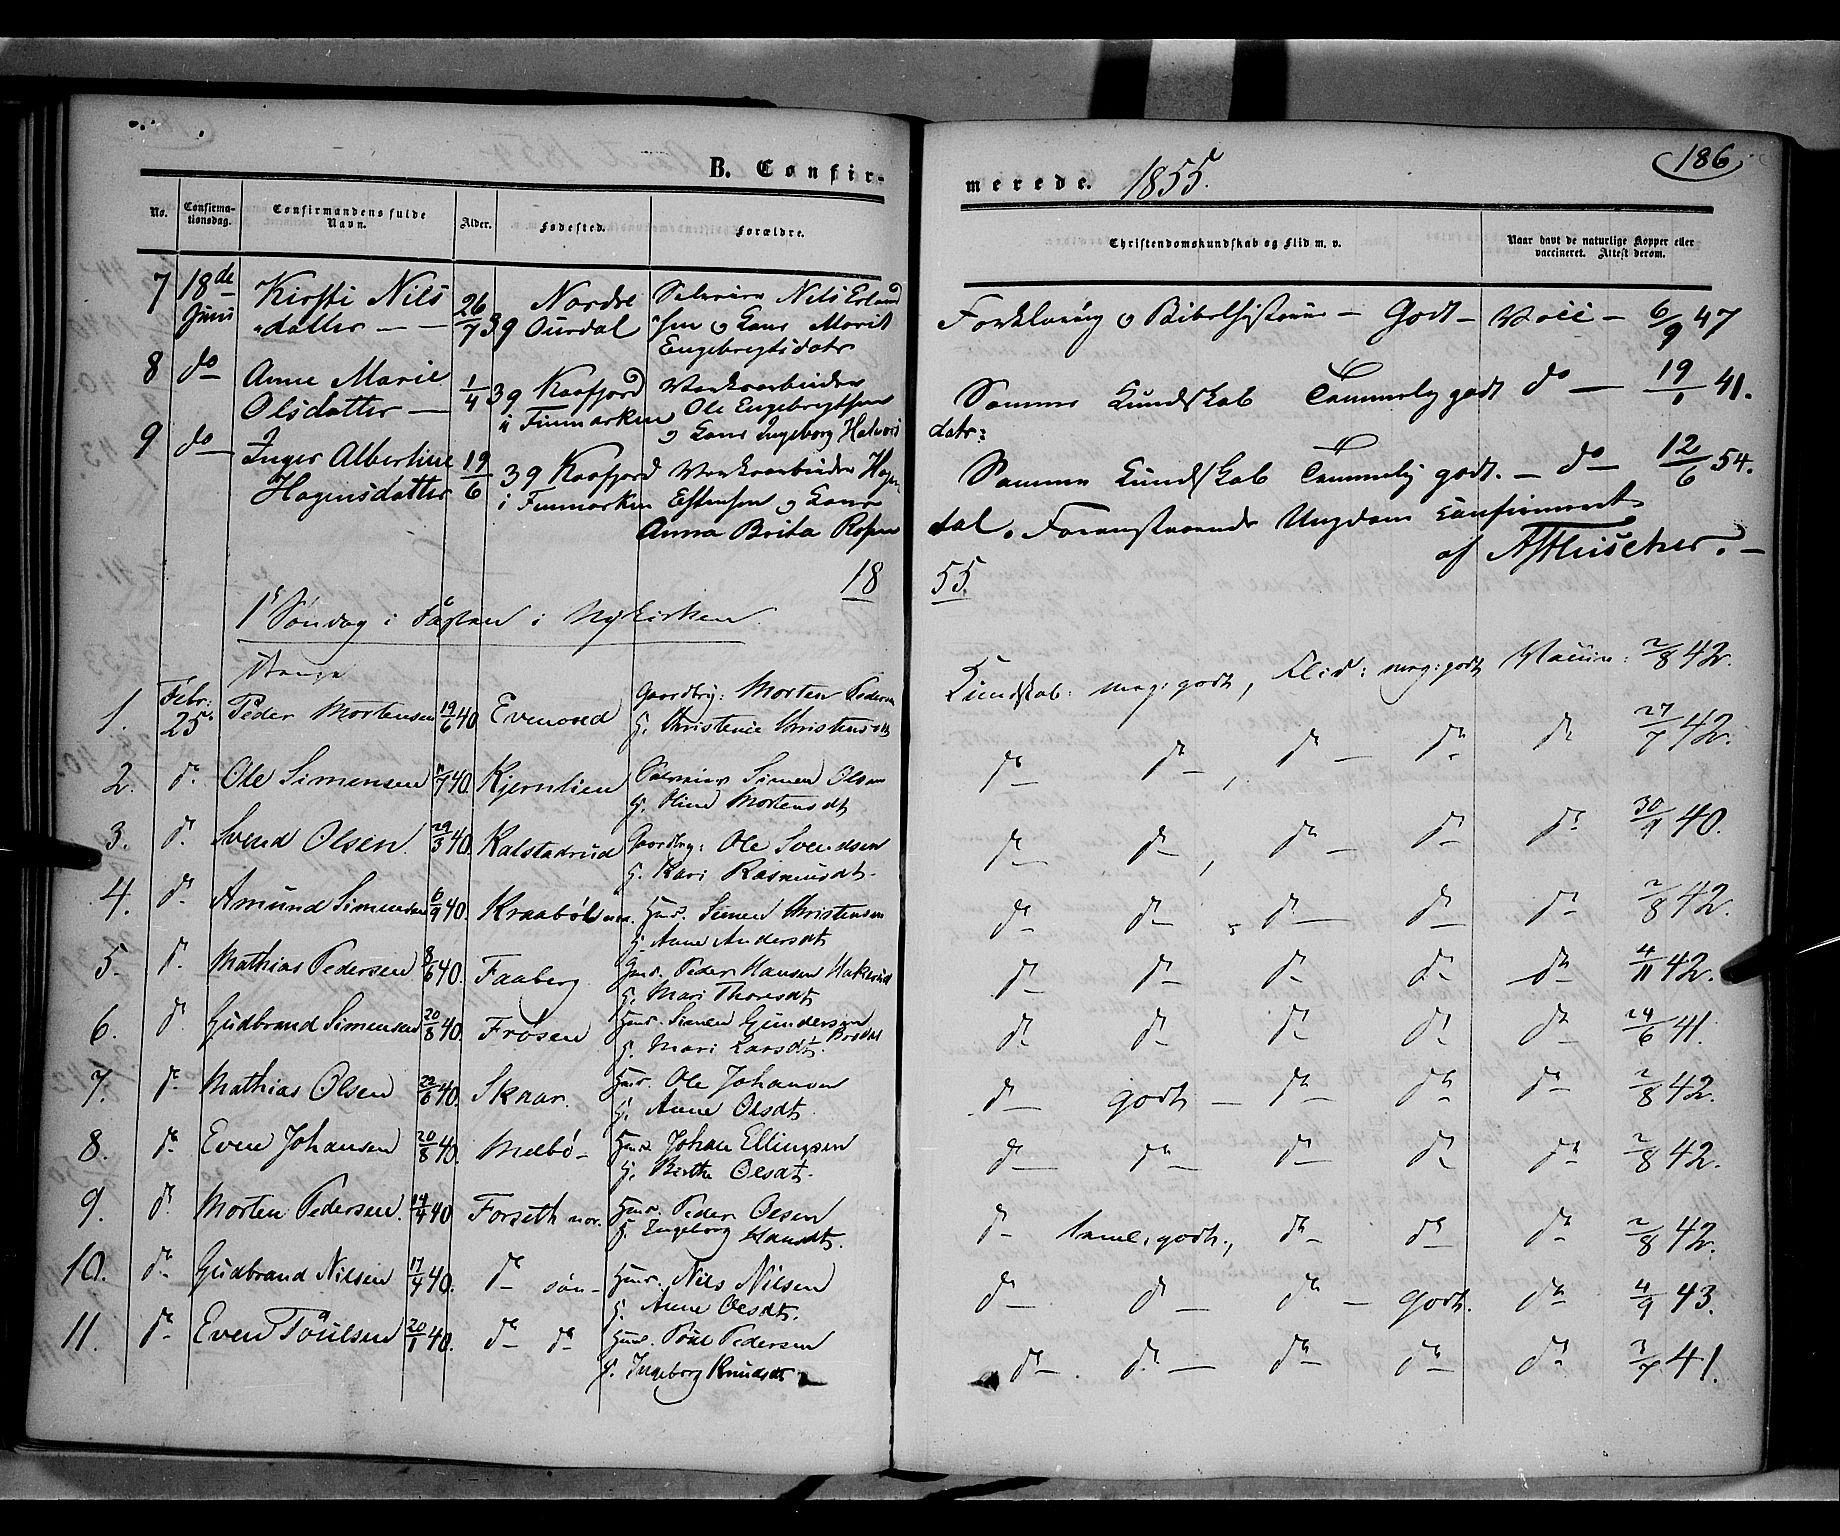 SAH, Gausdal prestekontor, Ministerialbok nr. 8, 1850-1861, s. 186